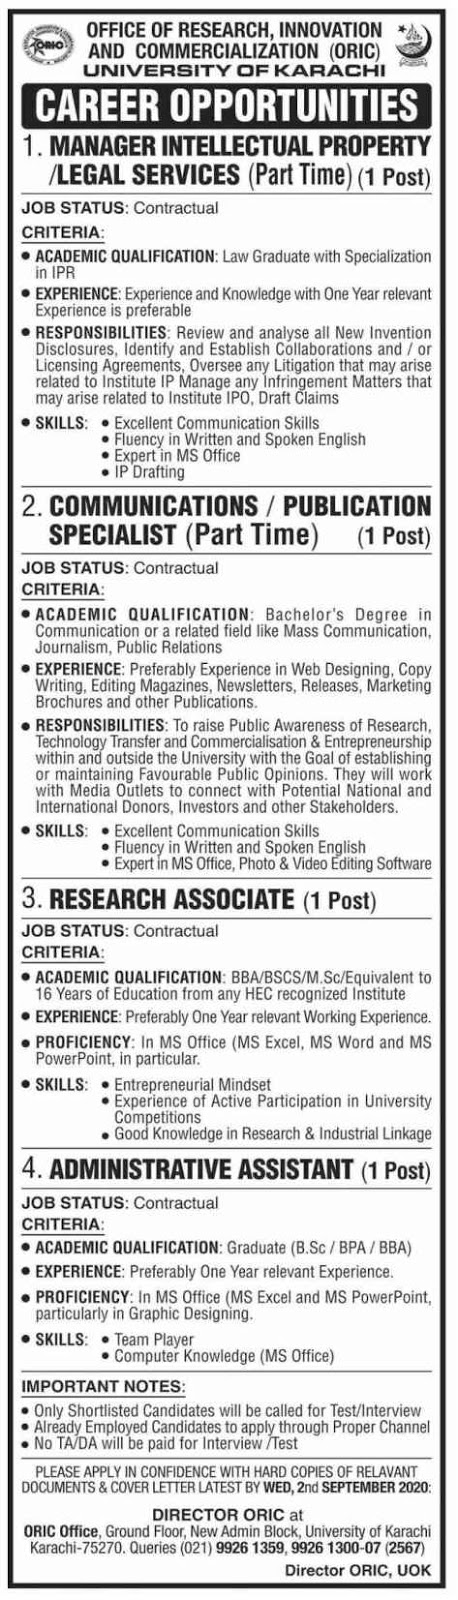 University of Karachi Jobs 2020 | Vacant Positions